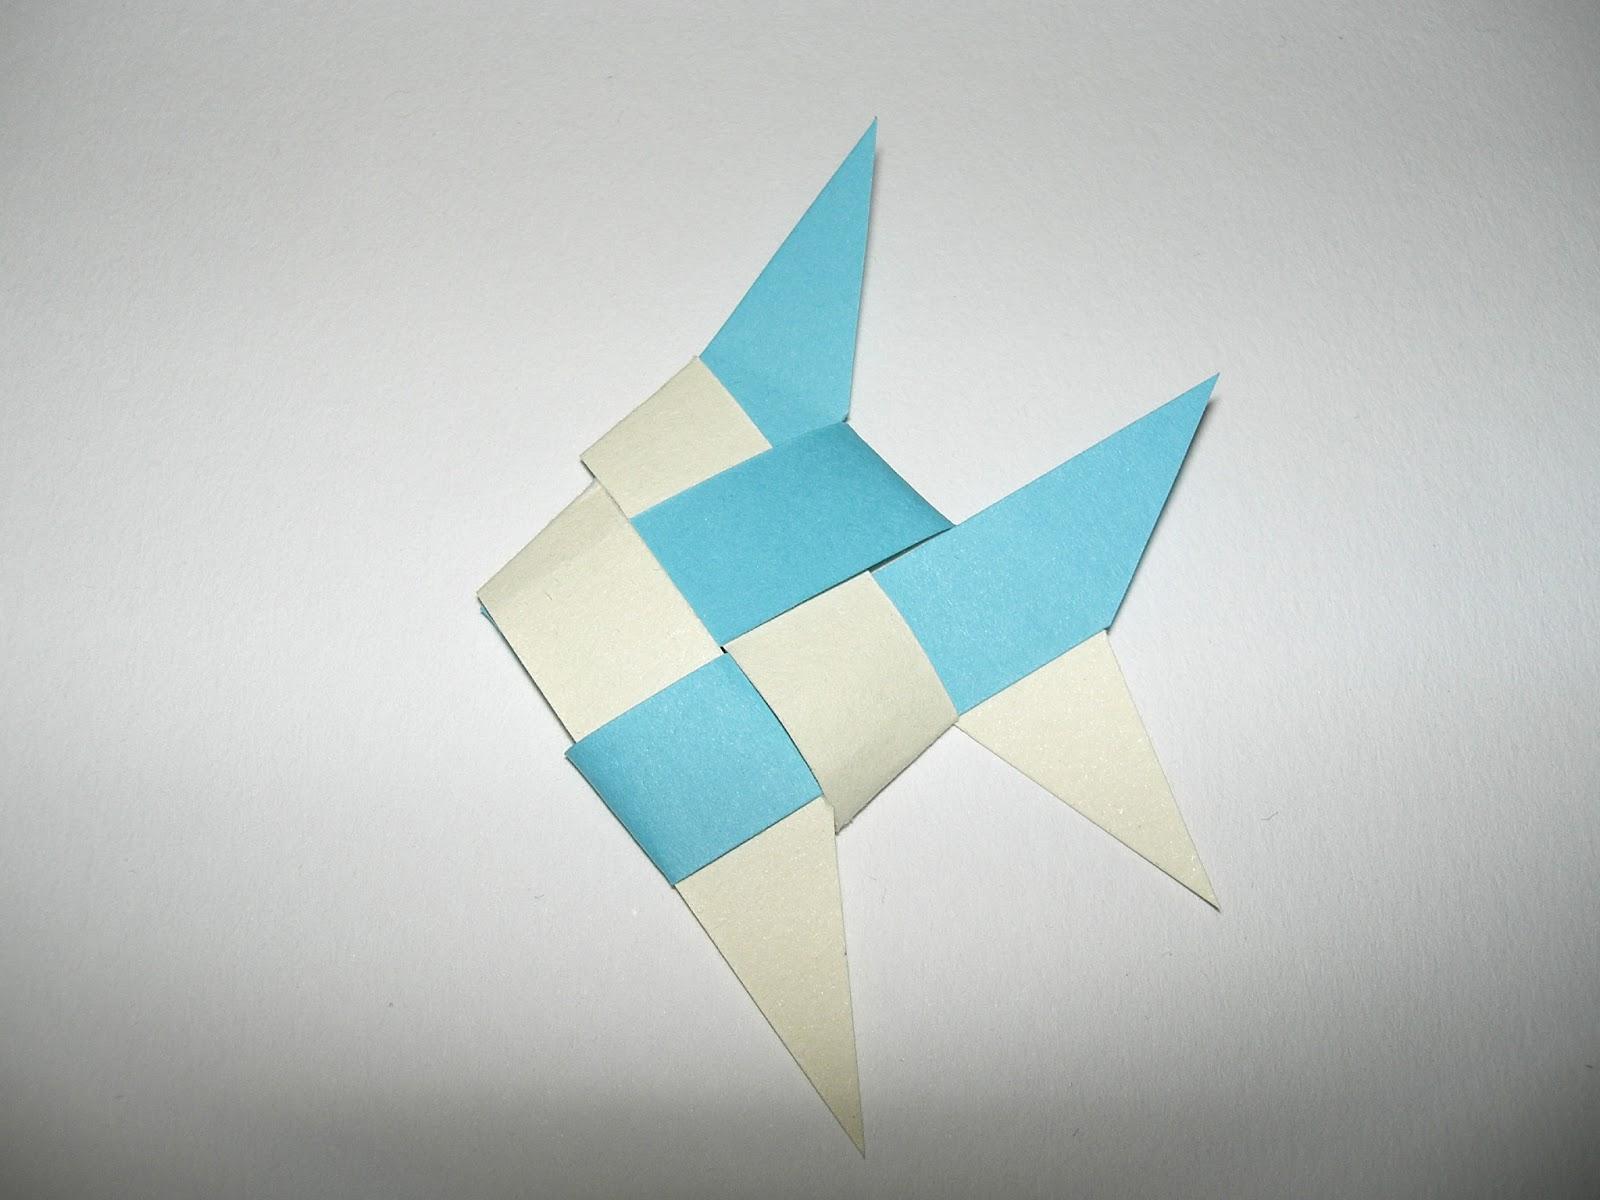 gabulle in wonderland guirlande de poissons en origami tuto. Black Bedroom Furniture Sets. Home Design Ideas